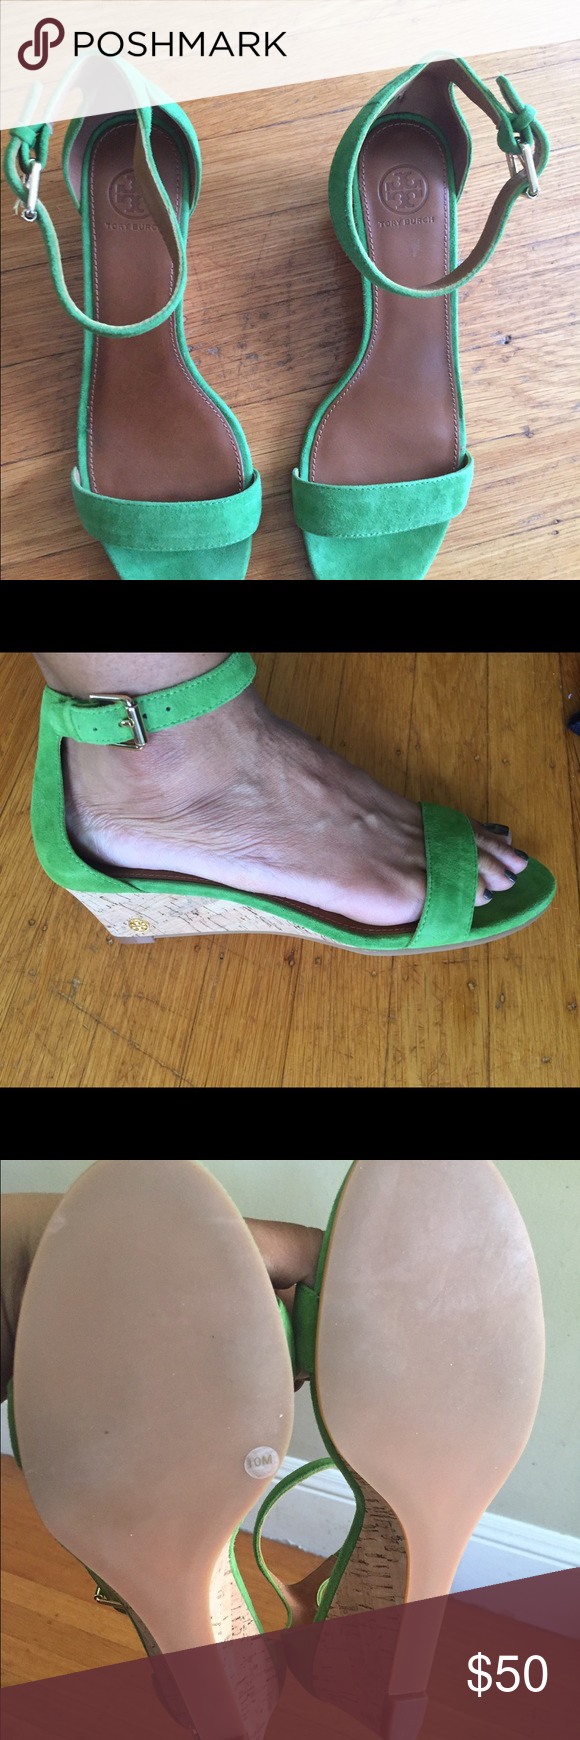 2fe3e050b5d6 Tory Burch wedge sandal Gorgeous (NIB) Tory Burch savannah 45 mm wedge  sandal in